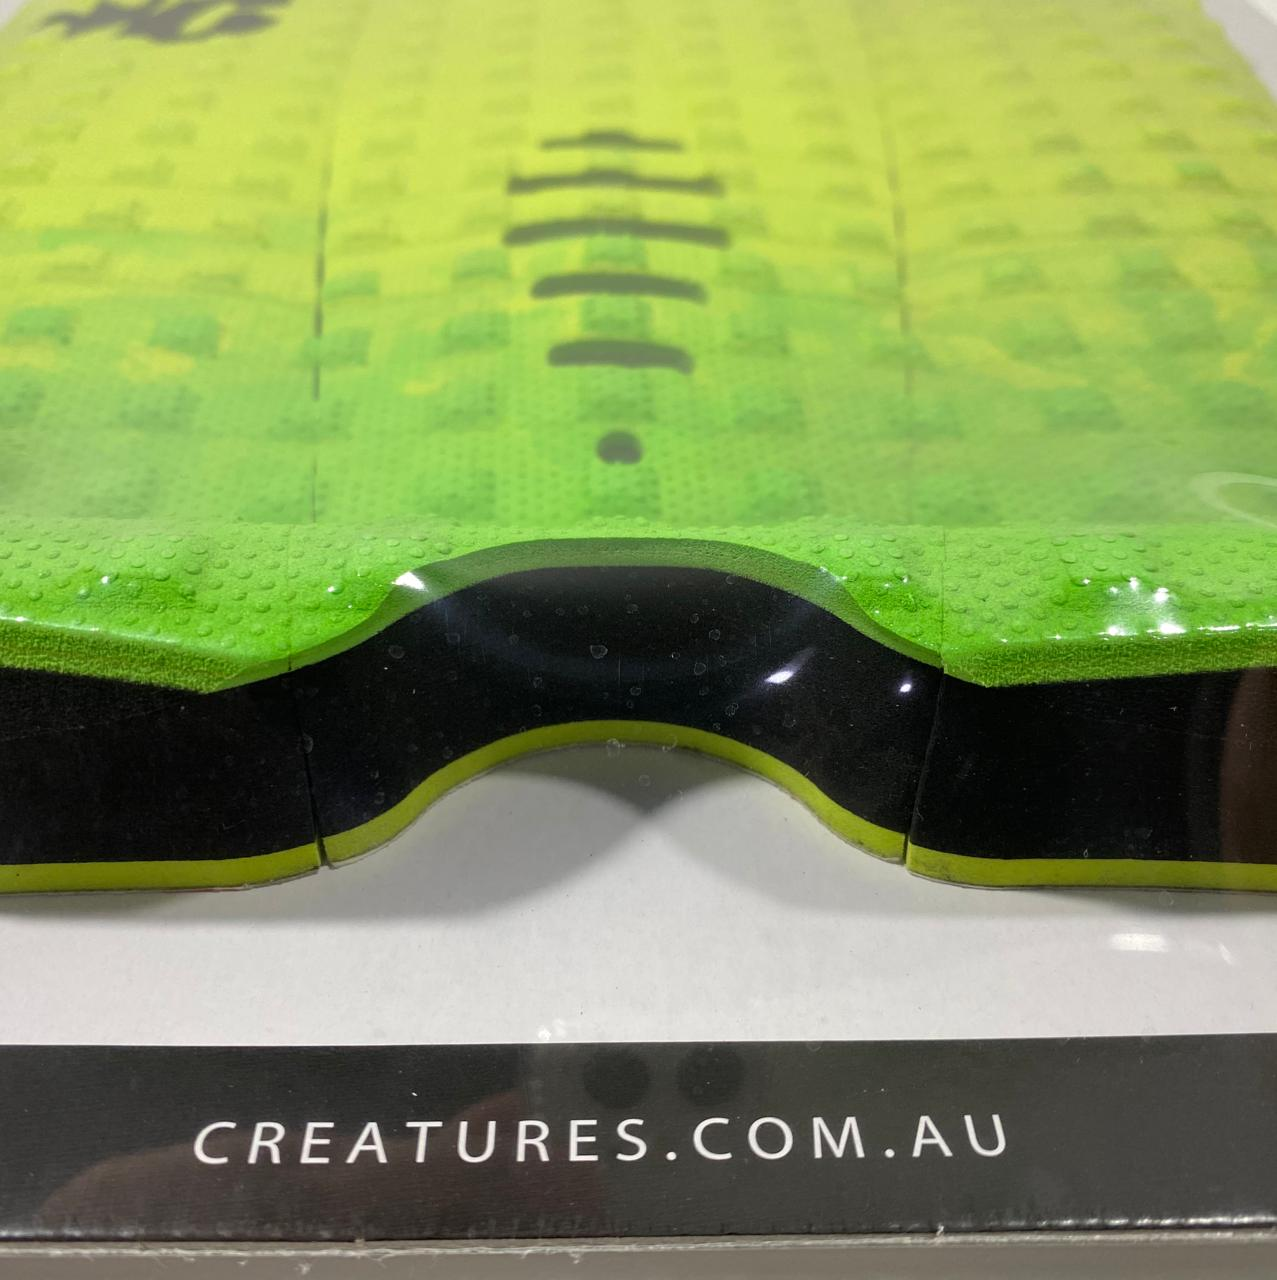 Deck Creatures Mick Fanning Lite - Citrus Fade Lime